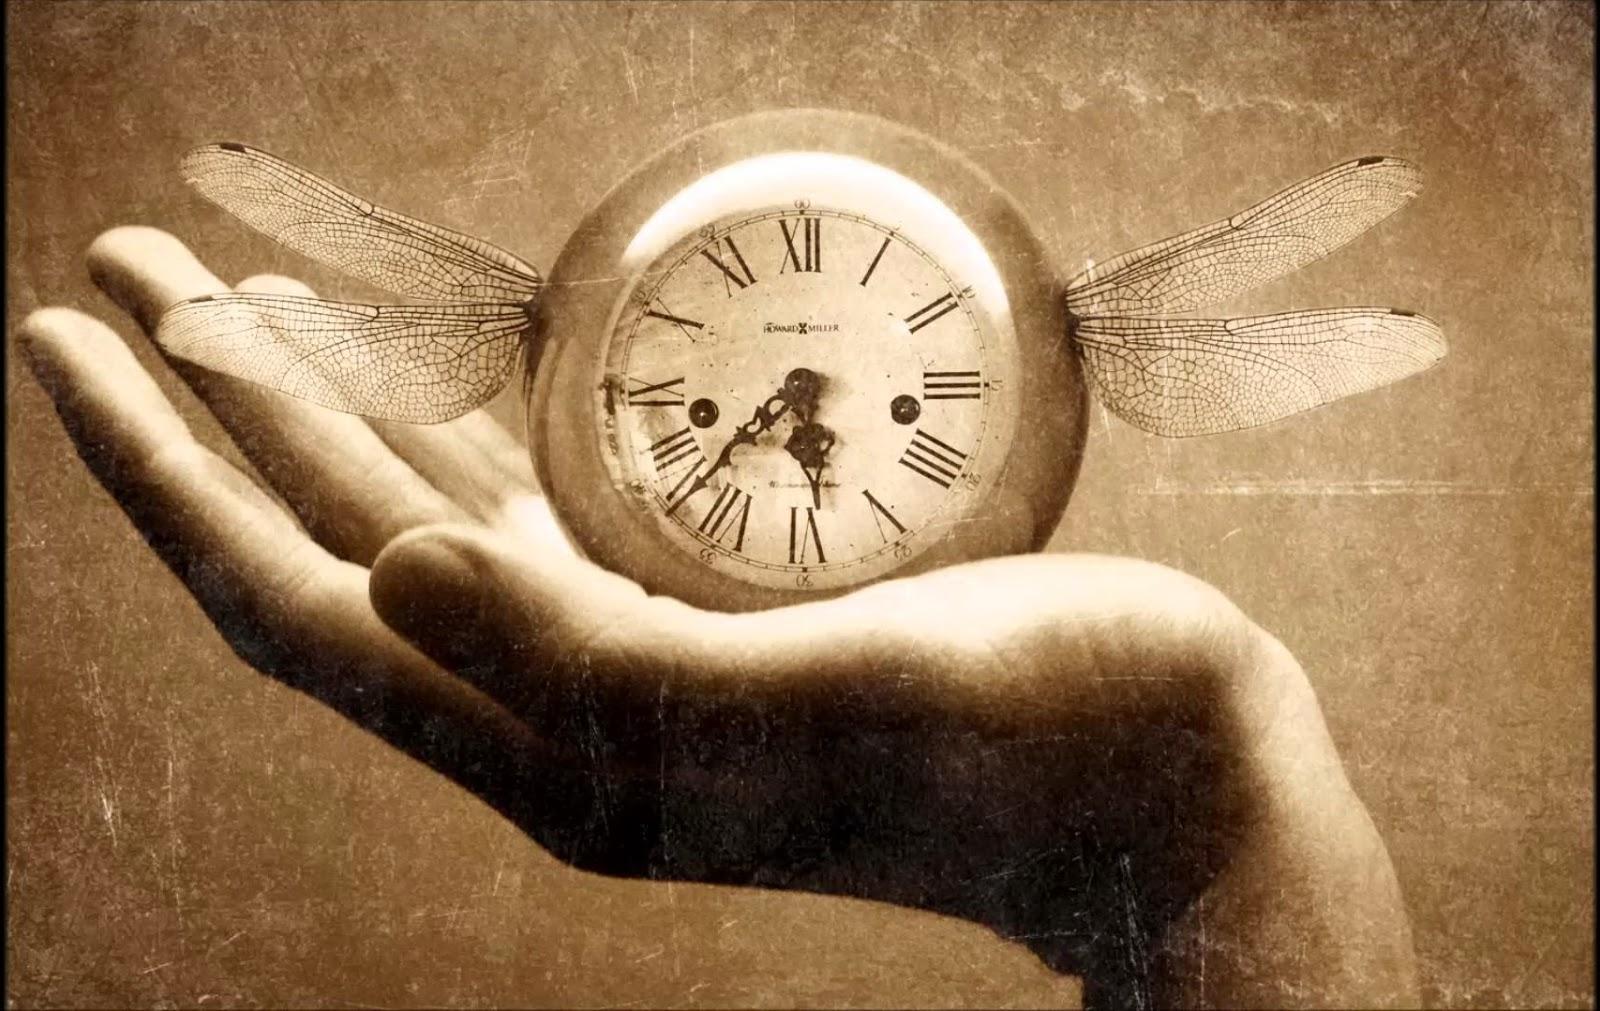 Get rid of bad habits by the lunar calendar